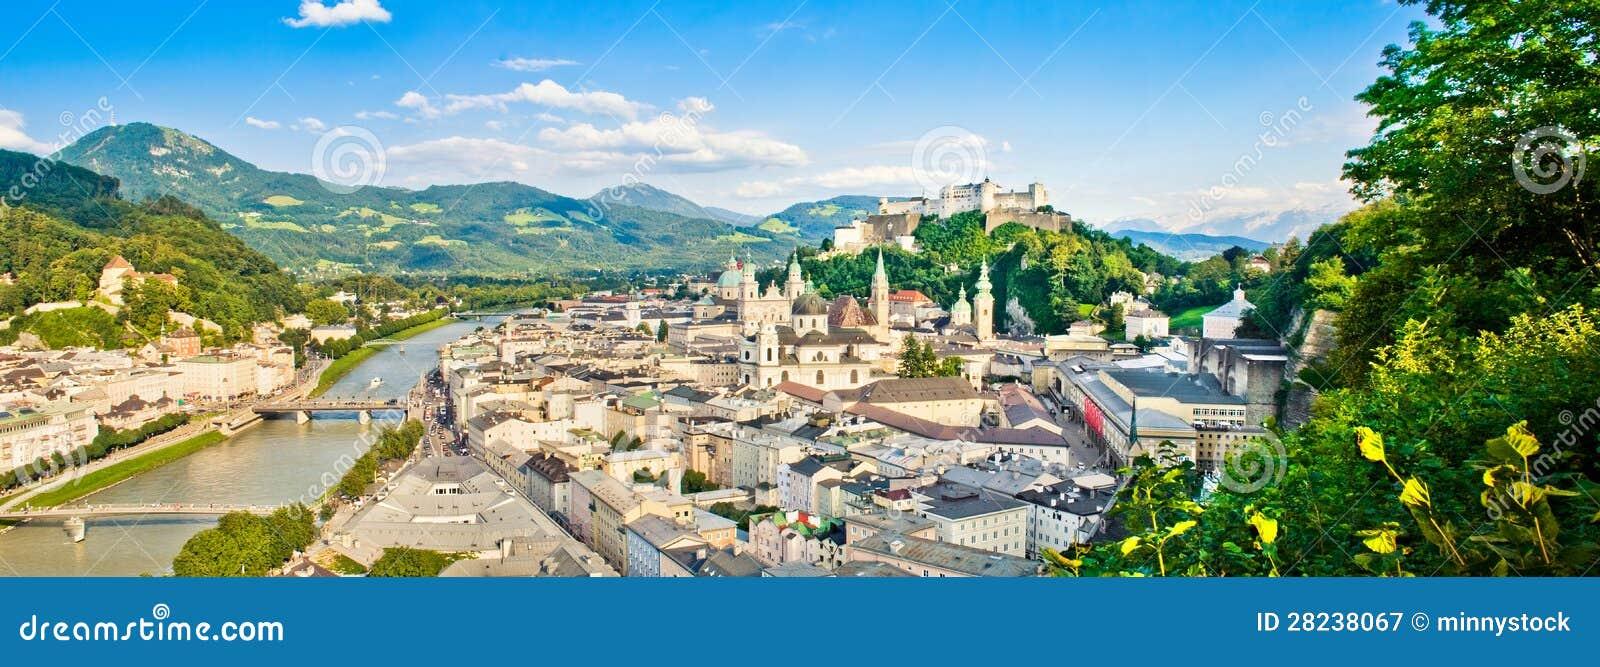 Vista panorámica de Salzburg, Austria